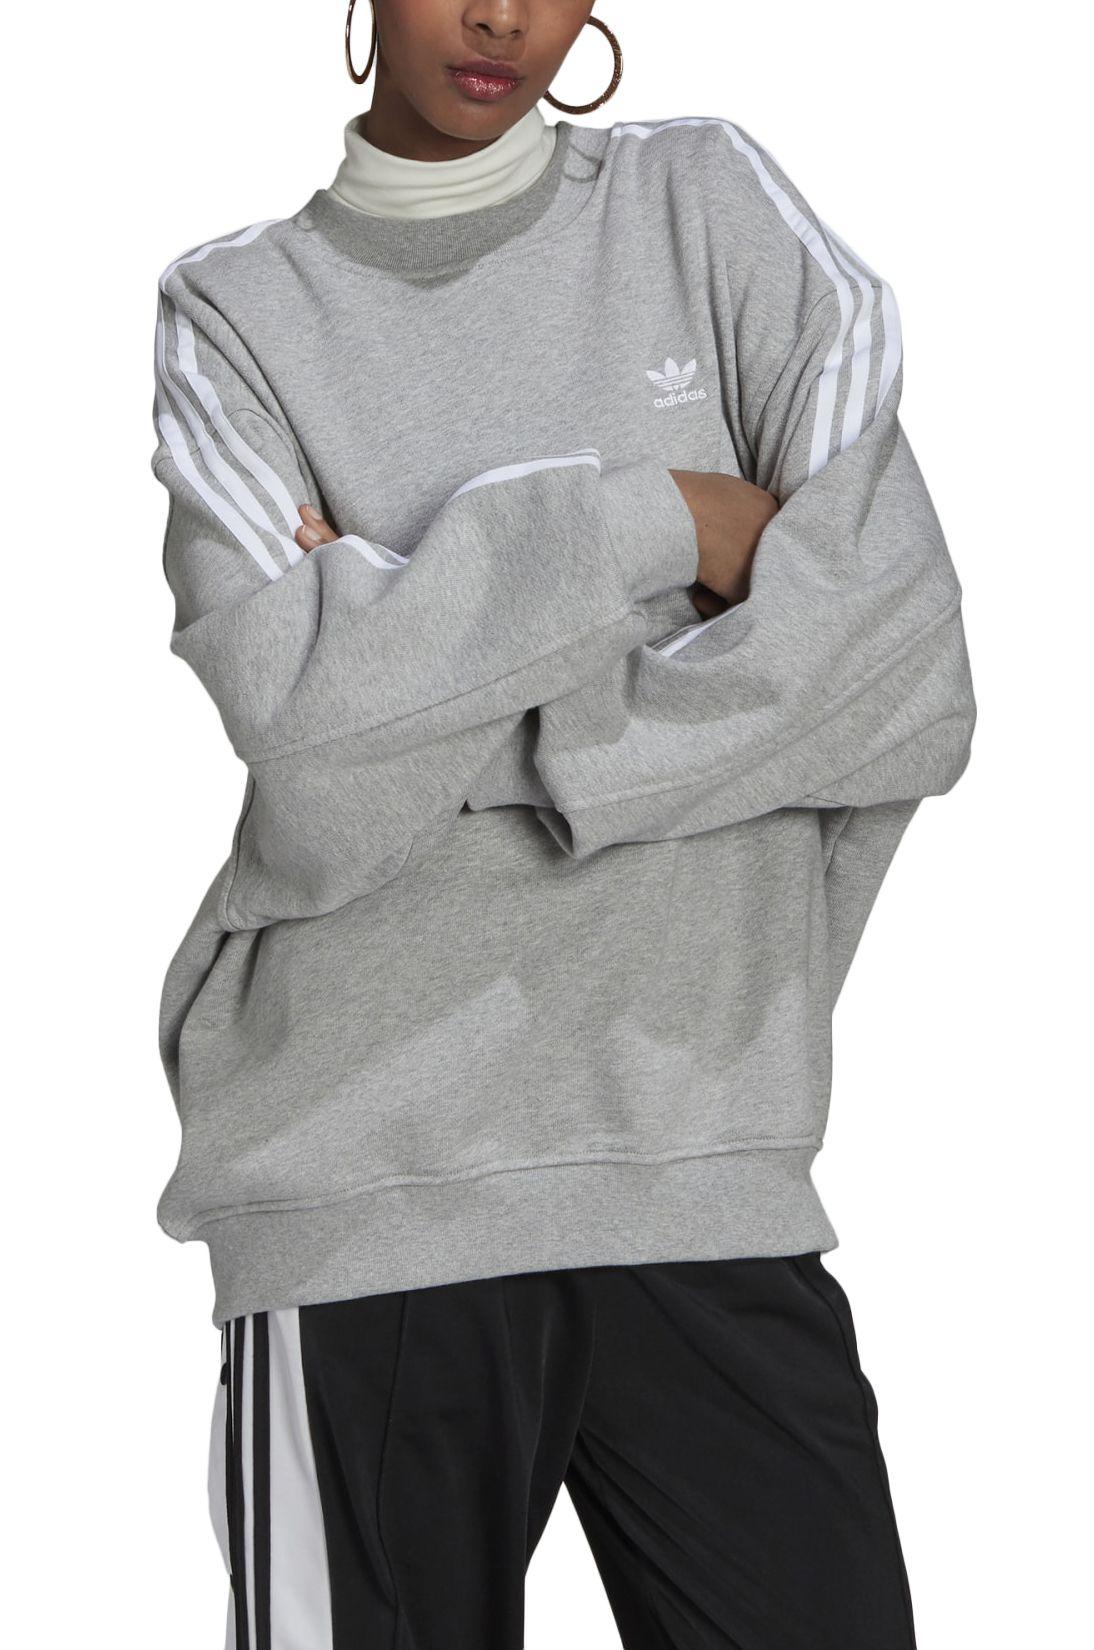 Adidas Crew Sweat OS SWEATSHIRT Megreyhtr